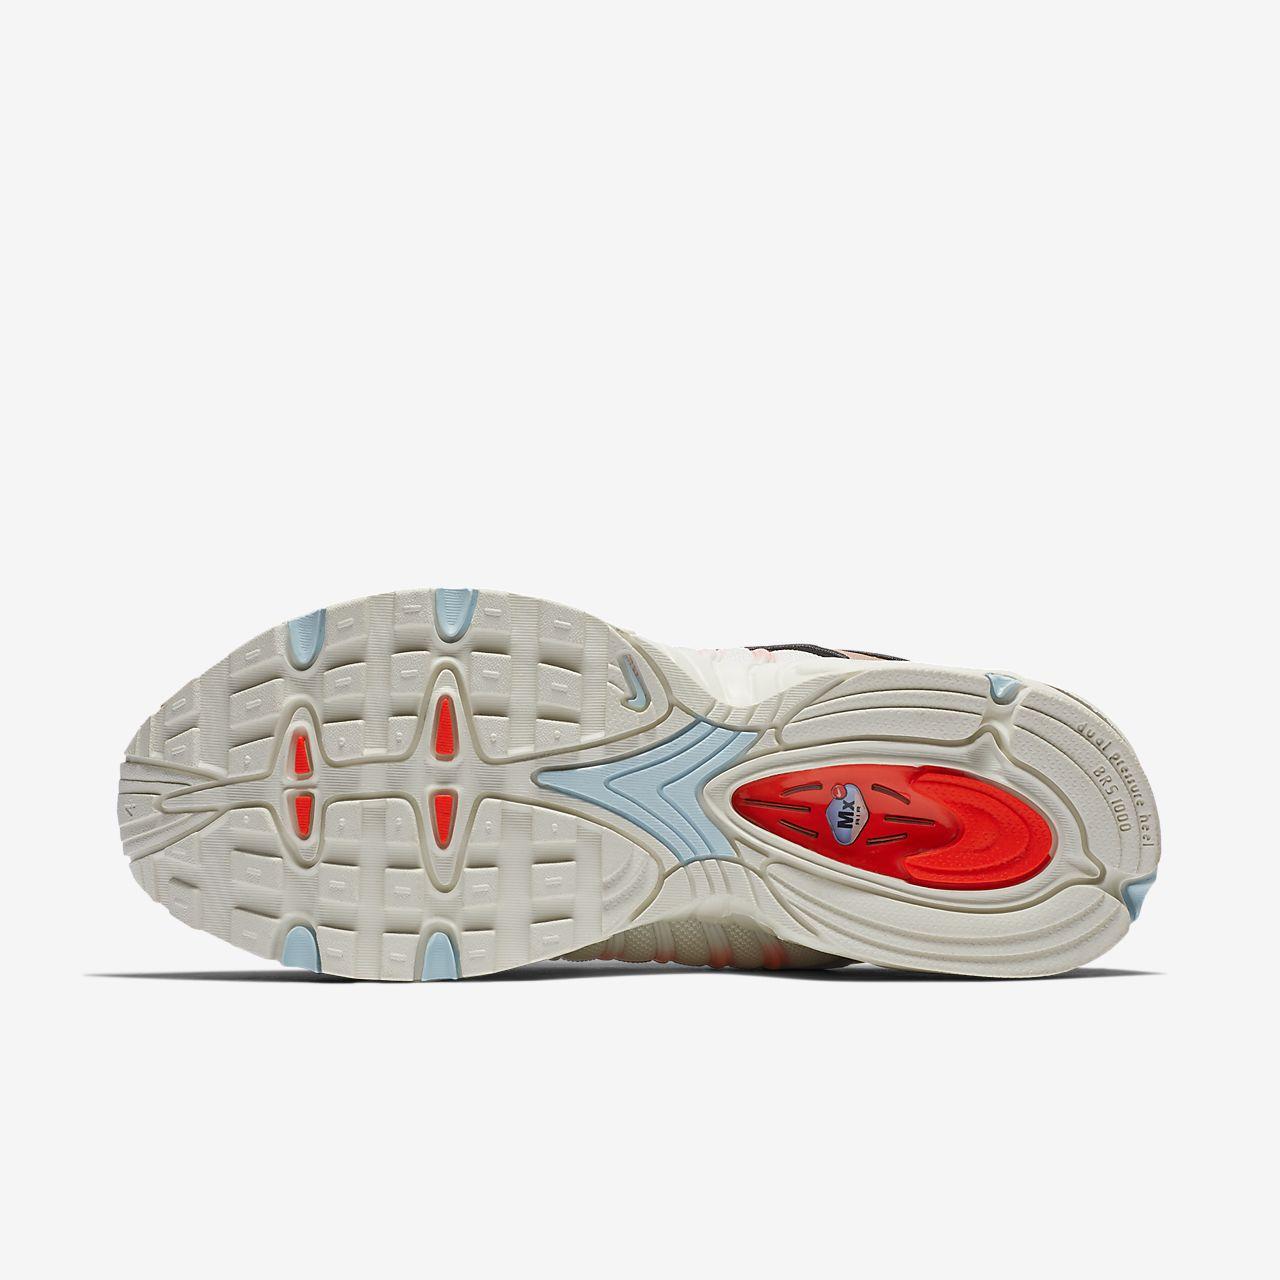 Scarpa Nike Air Max Tailwind IV Donna